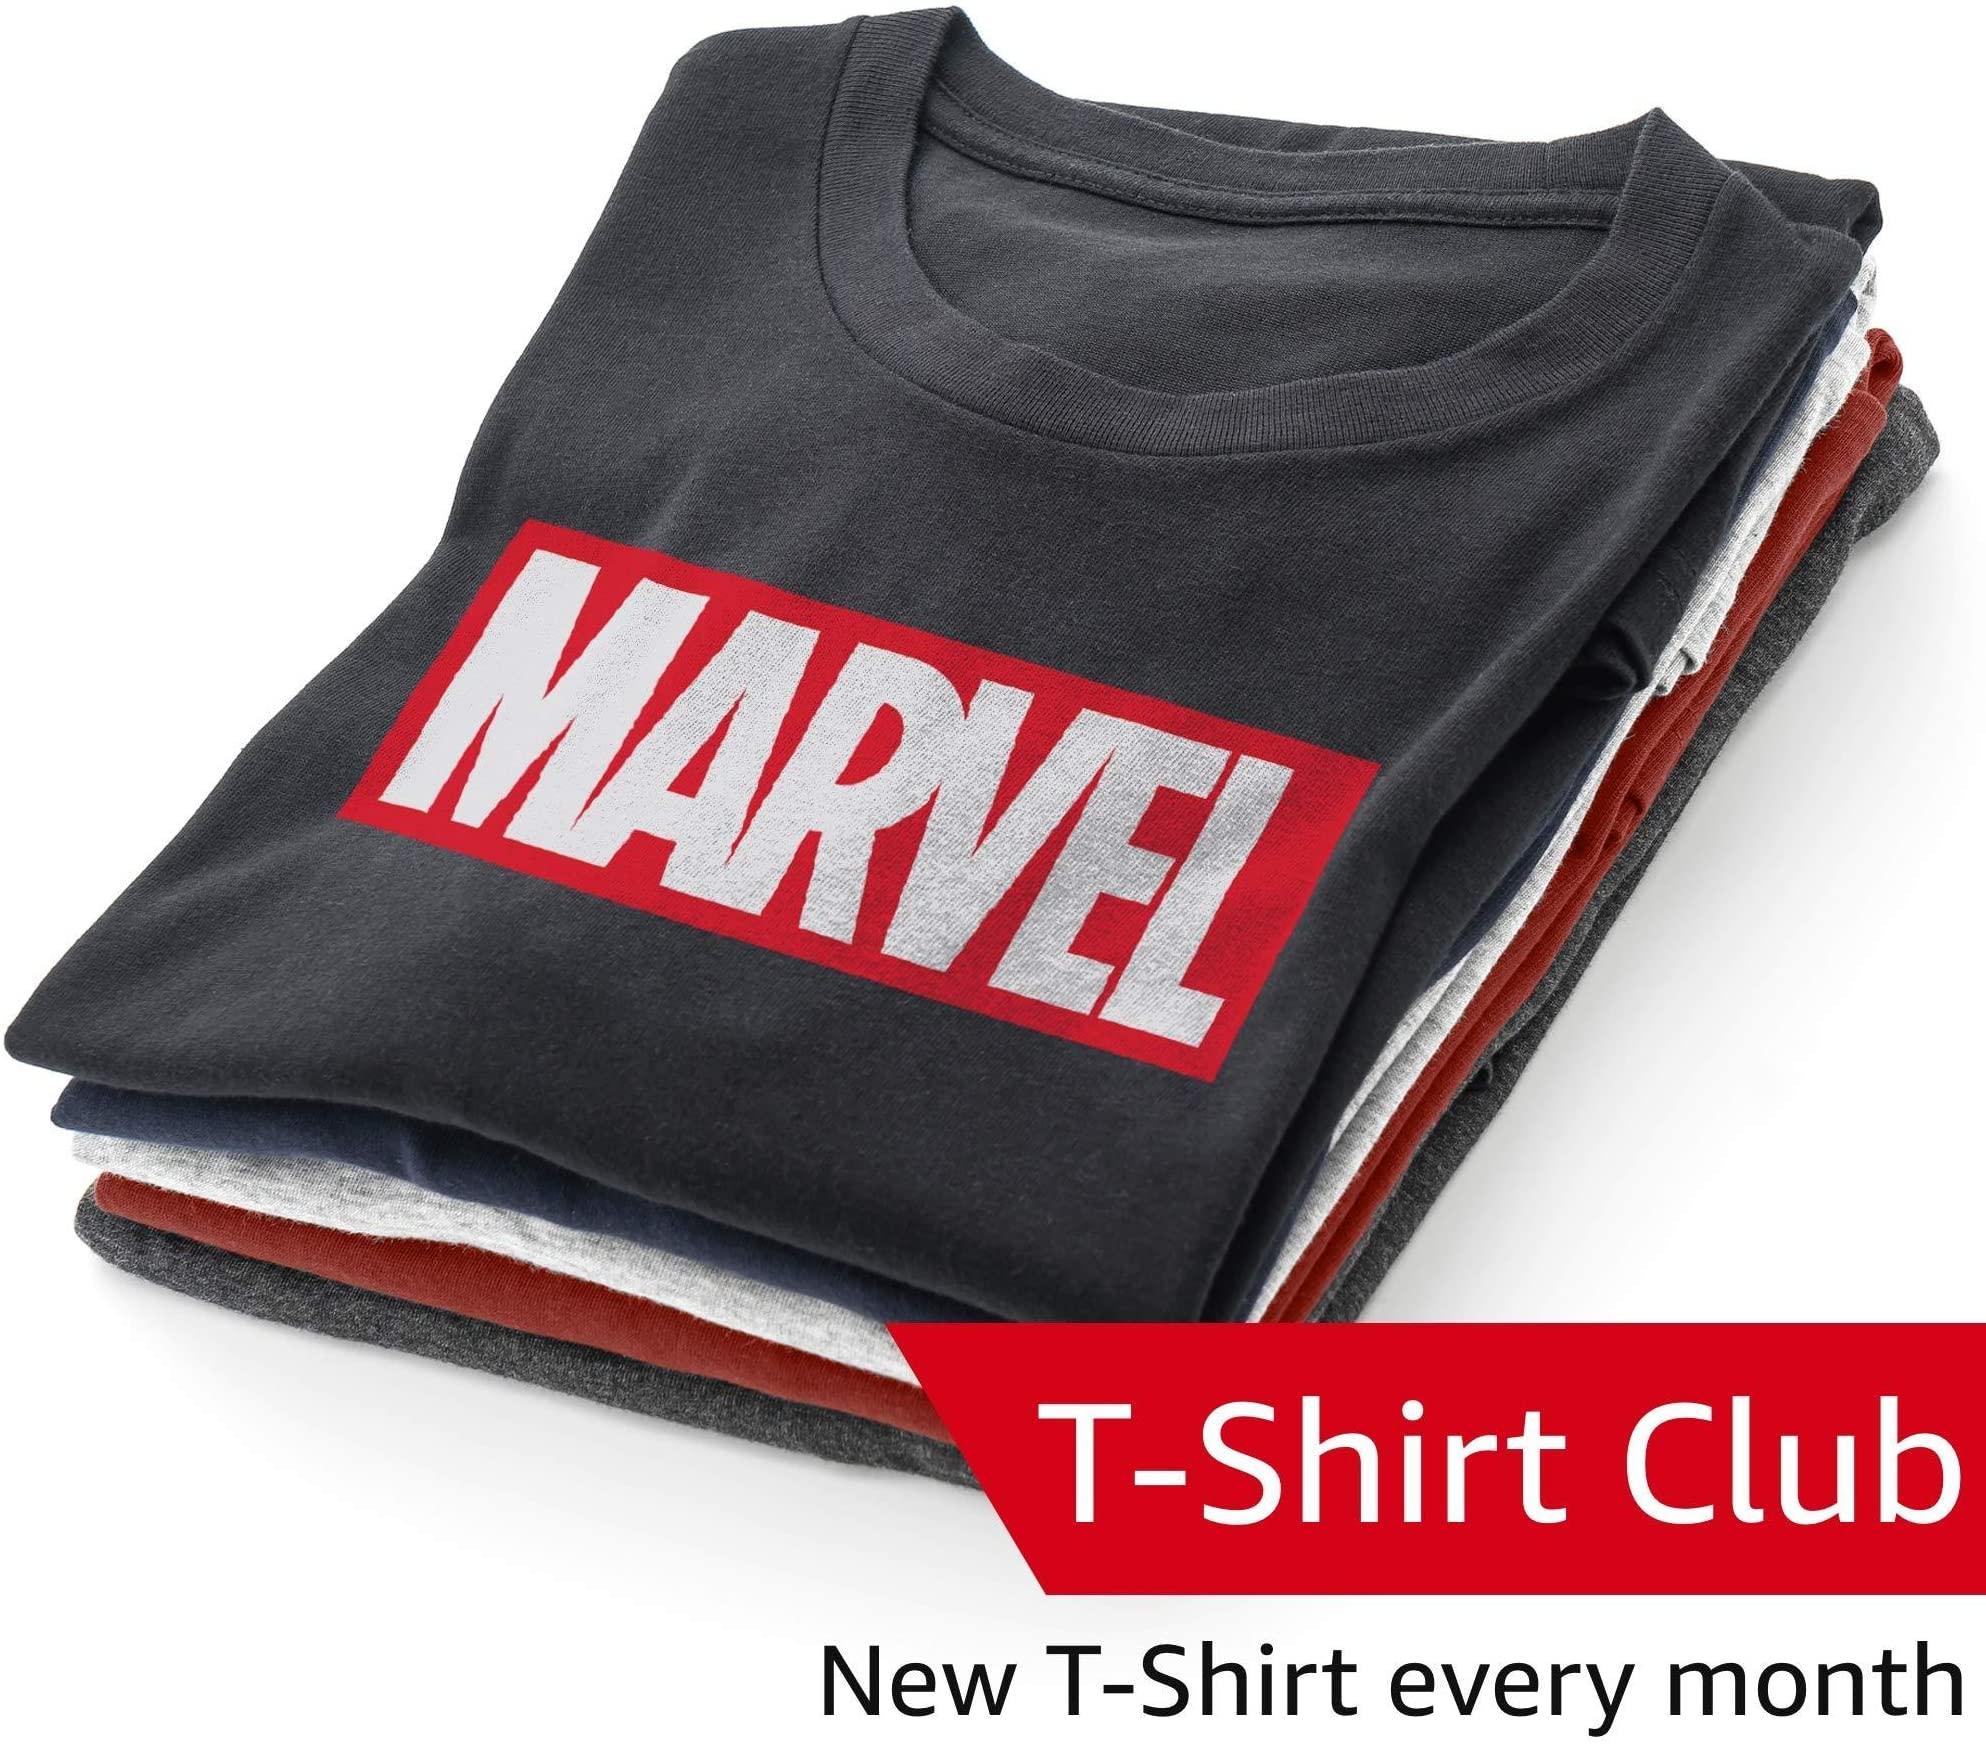 Discover Marvel's Design Vault Club T-Shirt Subscription on Amazon.